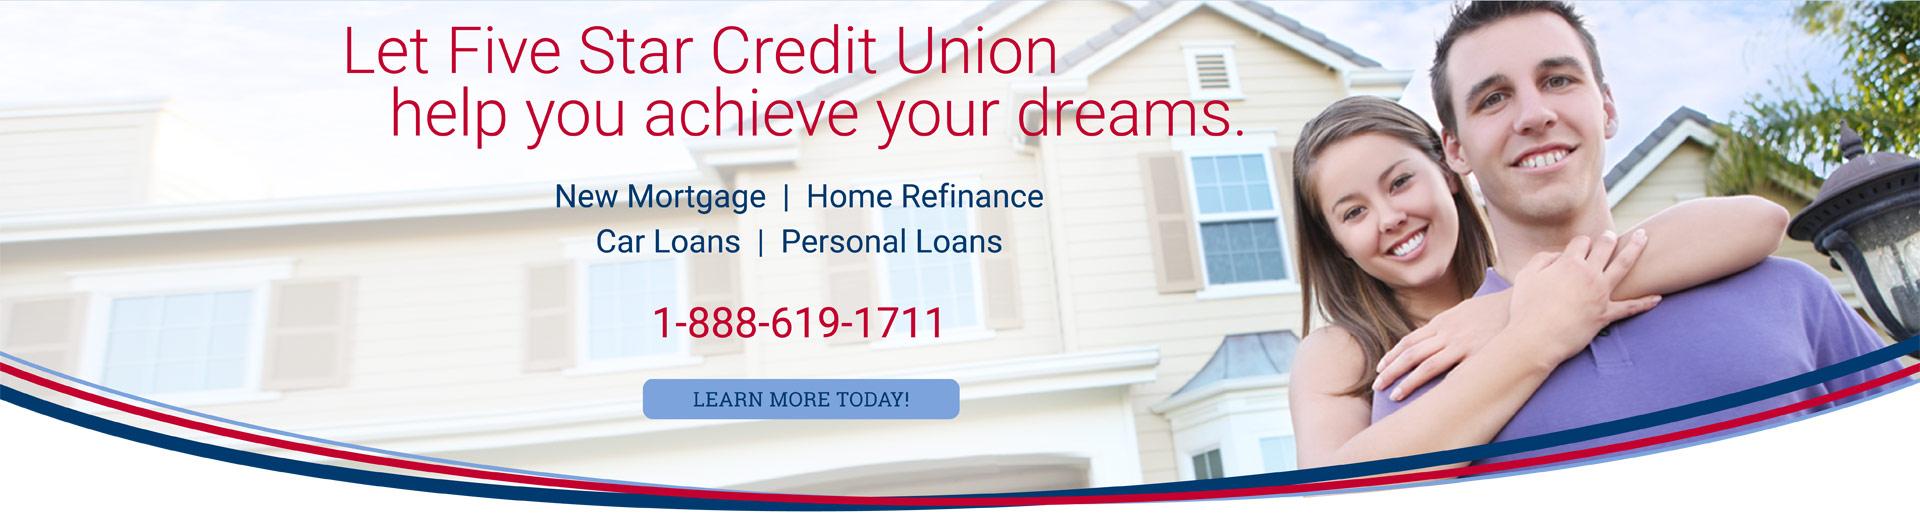 let-five-star-credit-union-help-you-achieve-your-dreams